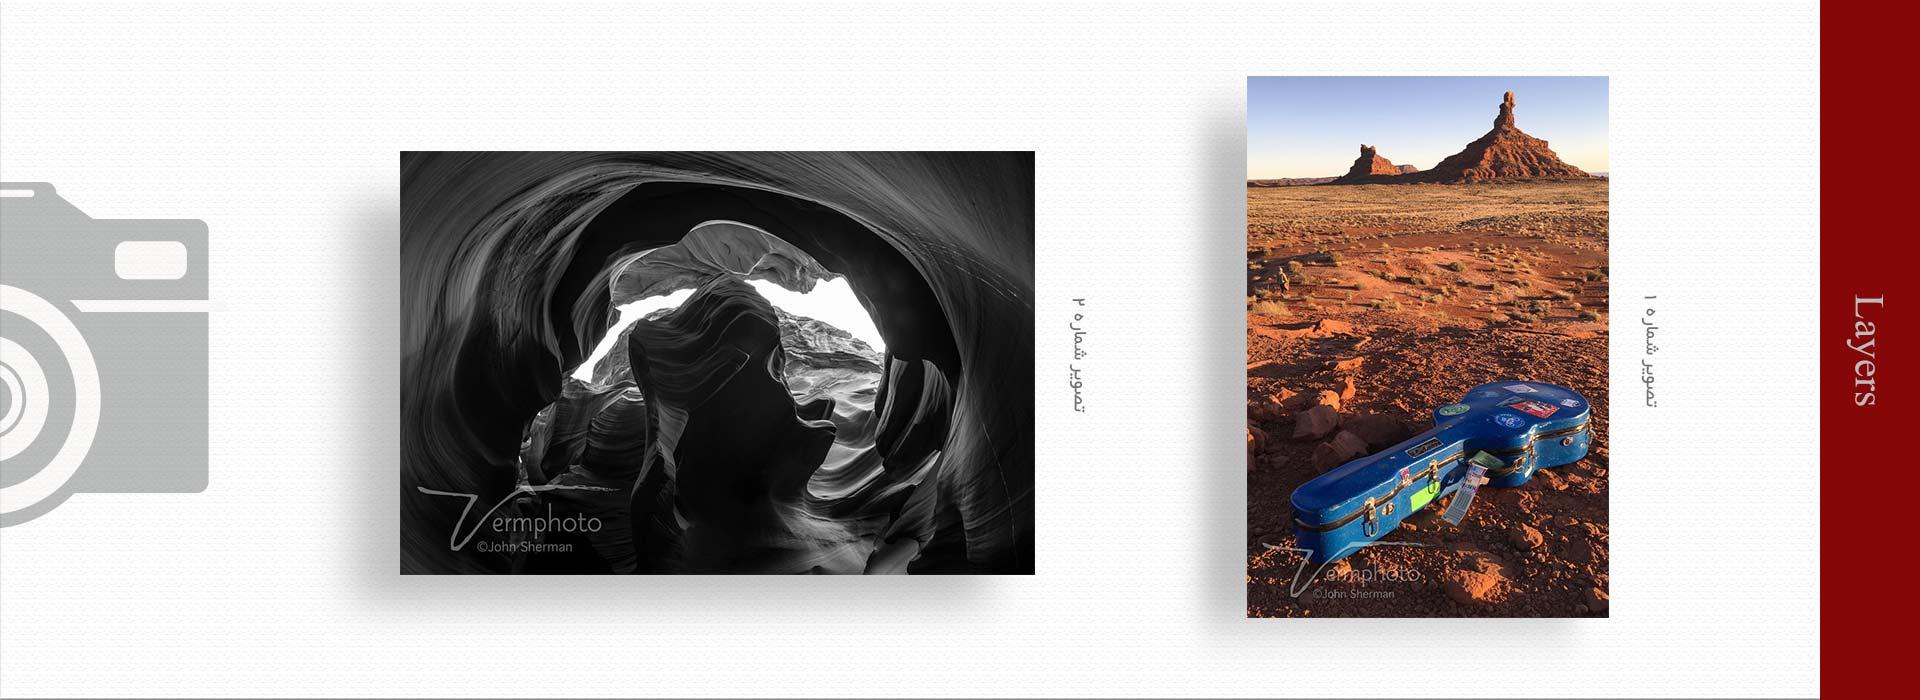 layers in photography - مهمترین ویژگی های عکس خوب چیست ؟